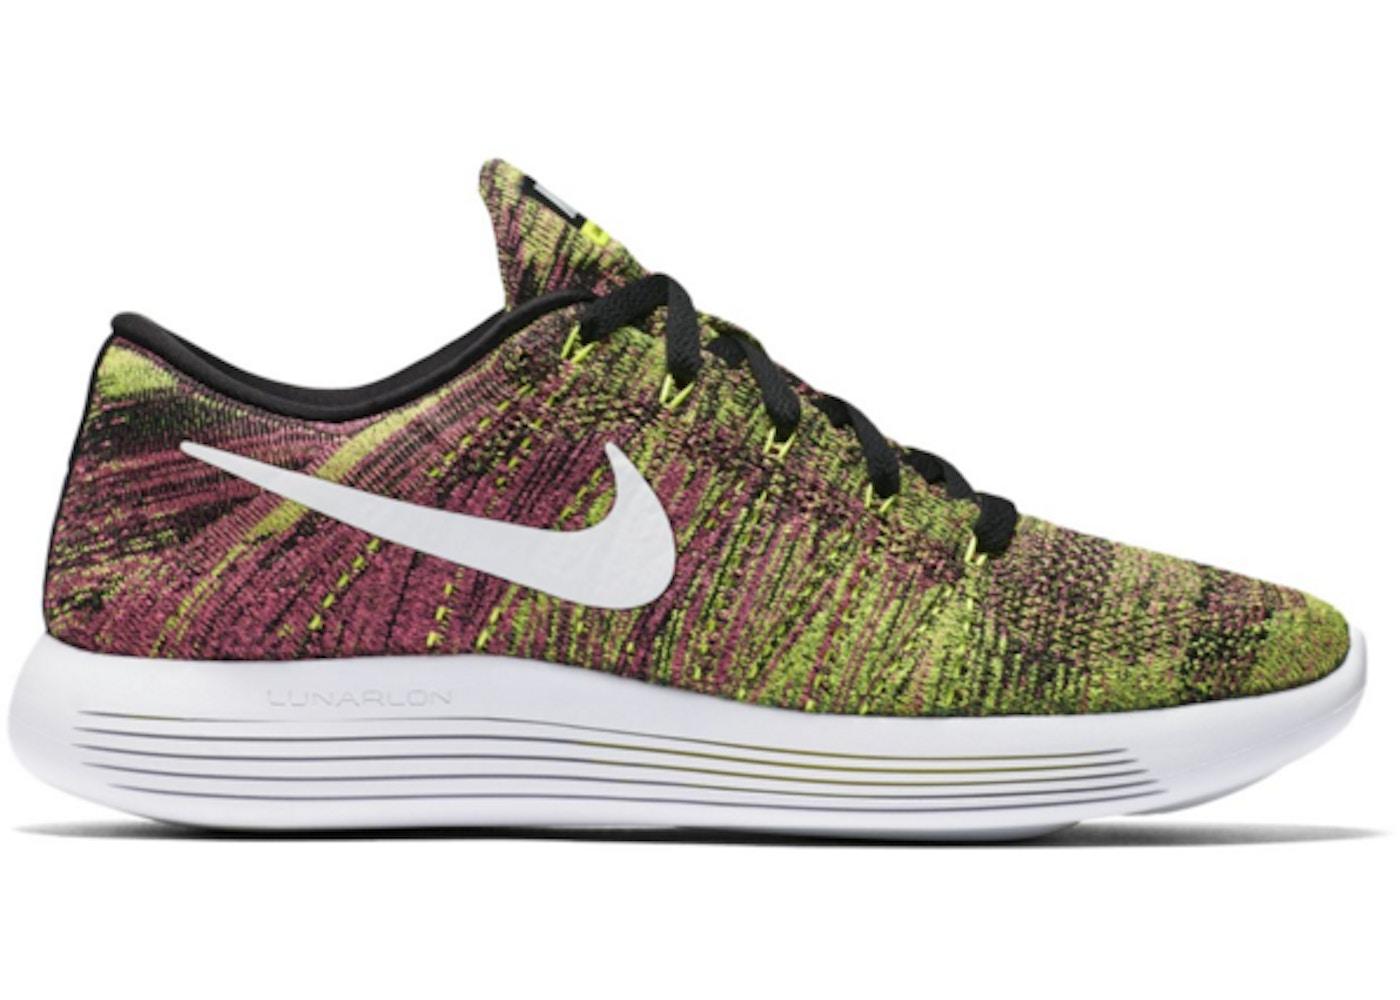 Nike LunarEpic Flyknit Low Multi-Color Unlimited - 844862-999 374b89c0c16ed